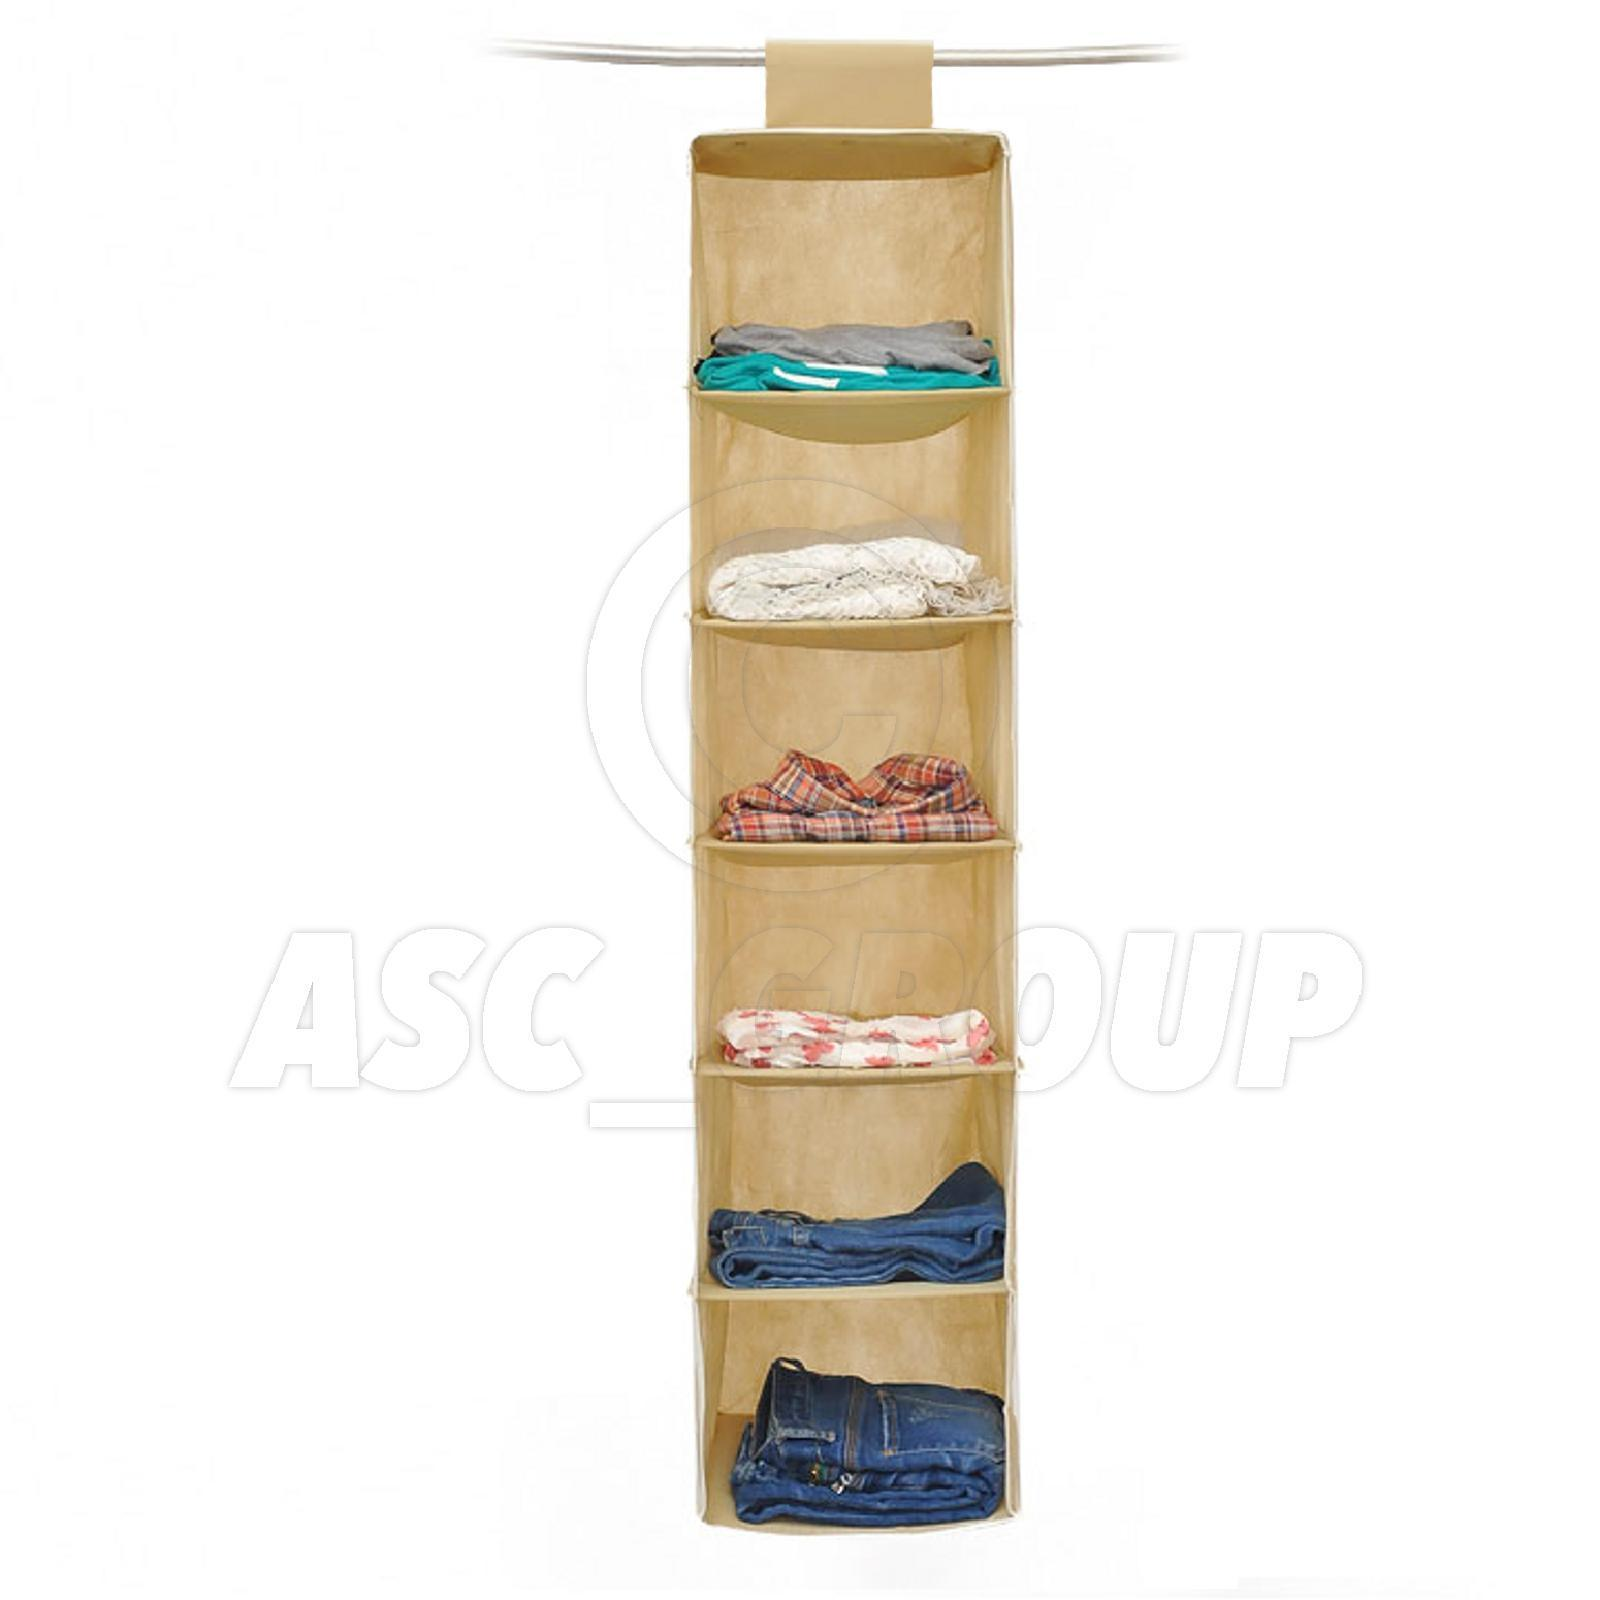 Armario organizador 6 secci n ropa prendas de vestir - Organizador de zapatos para armario ...